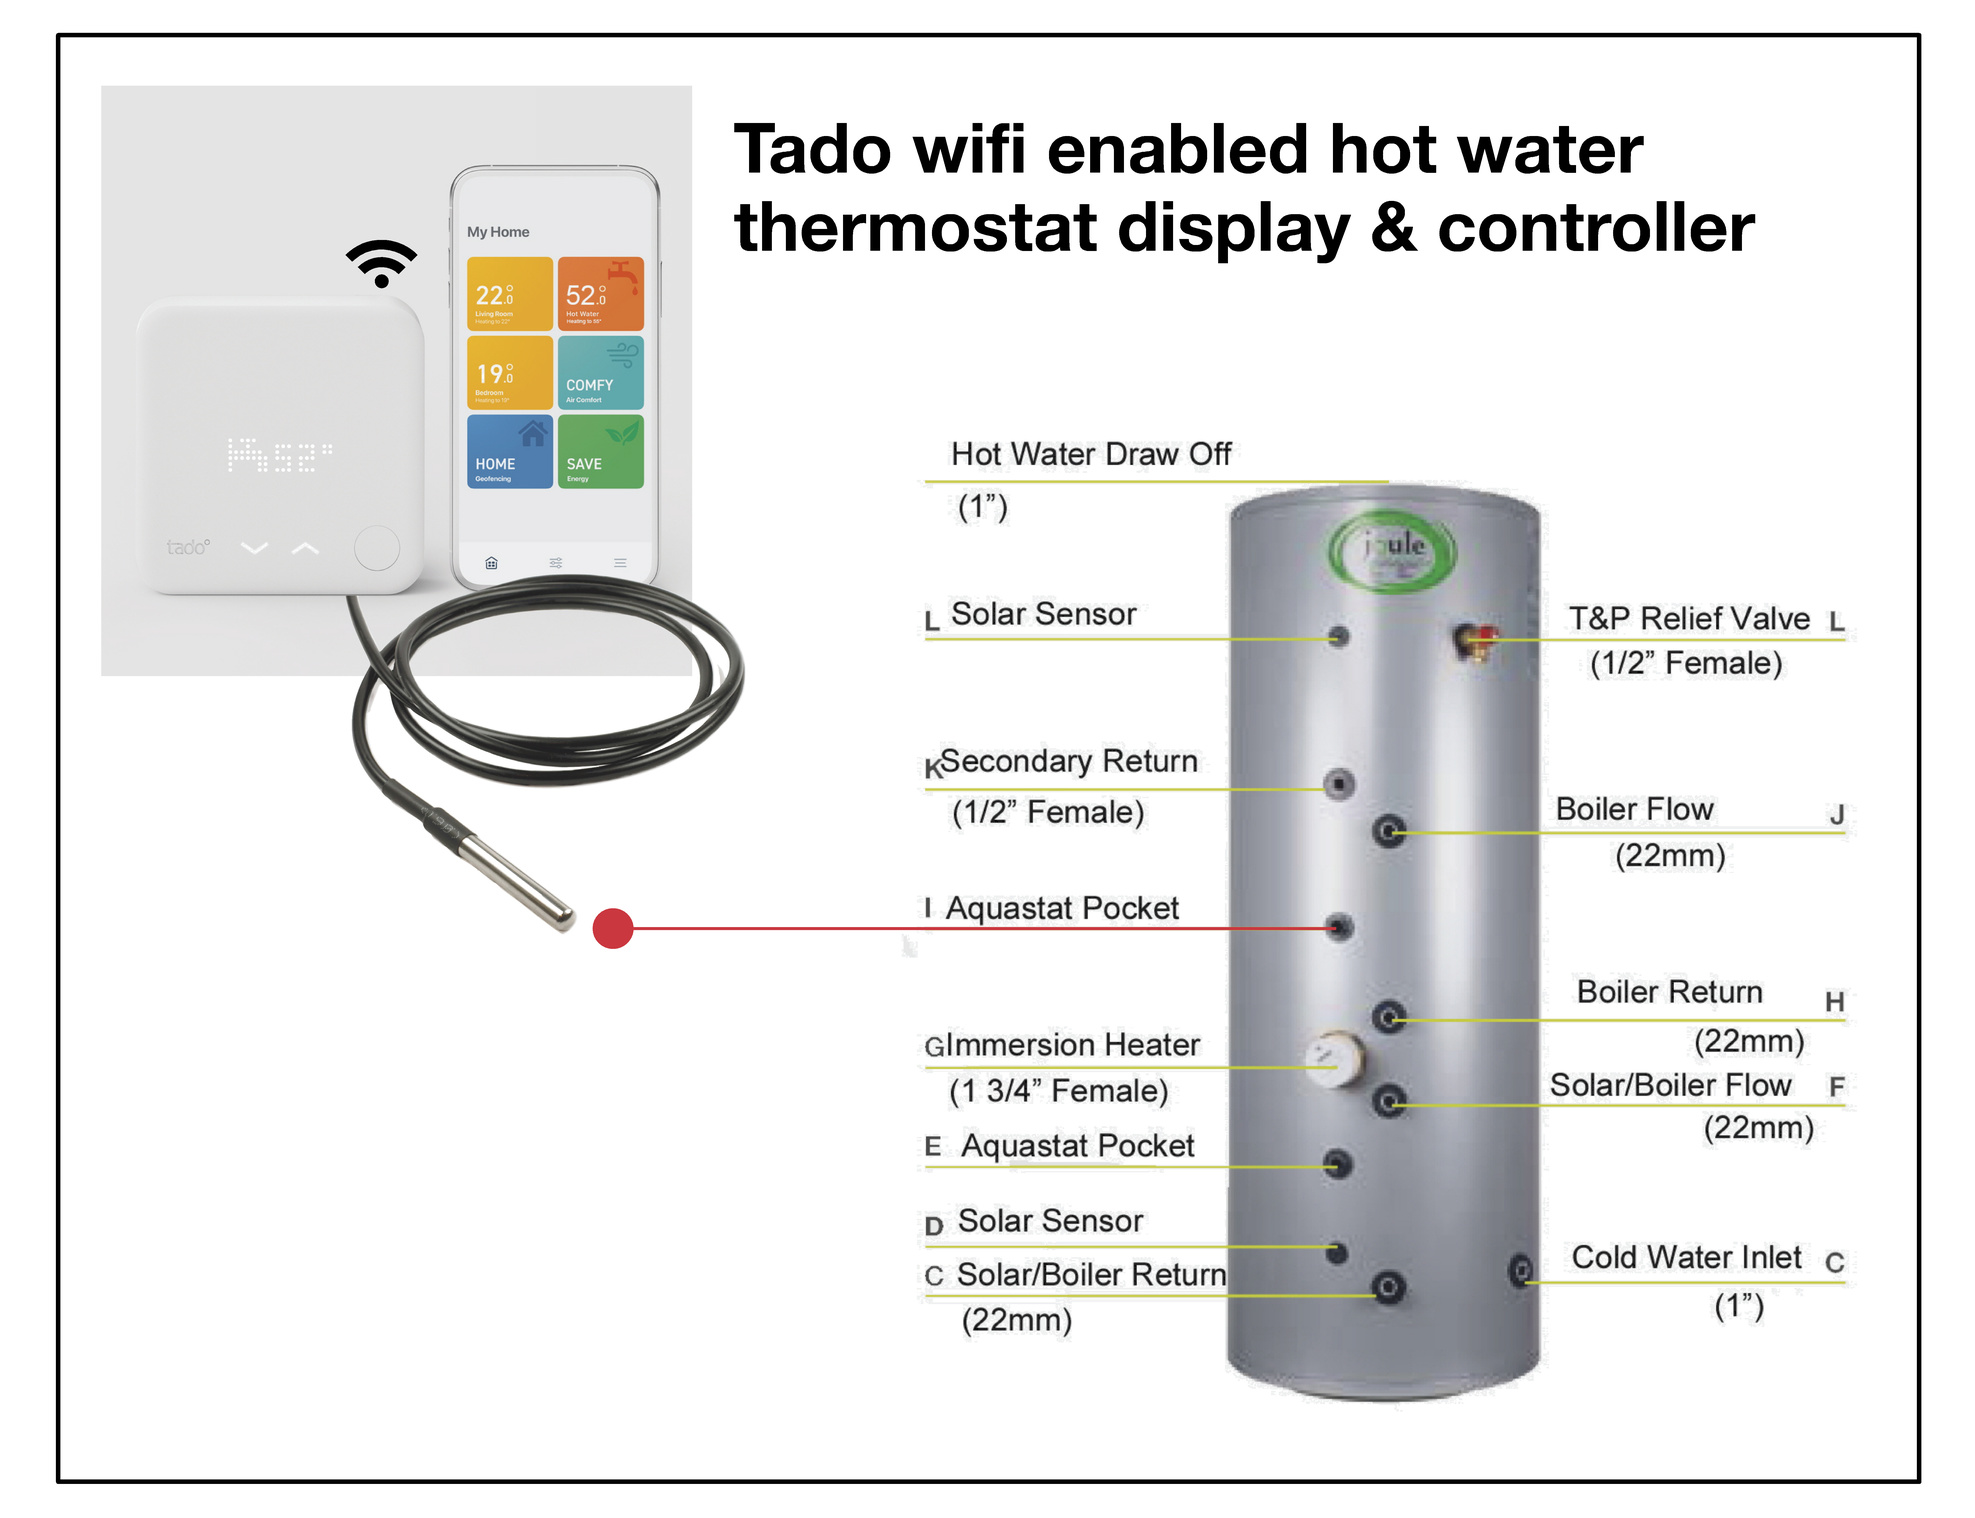 Tado Wifi Hot Water Display & Controler.JPG